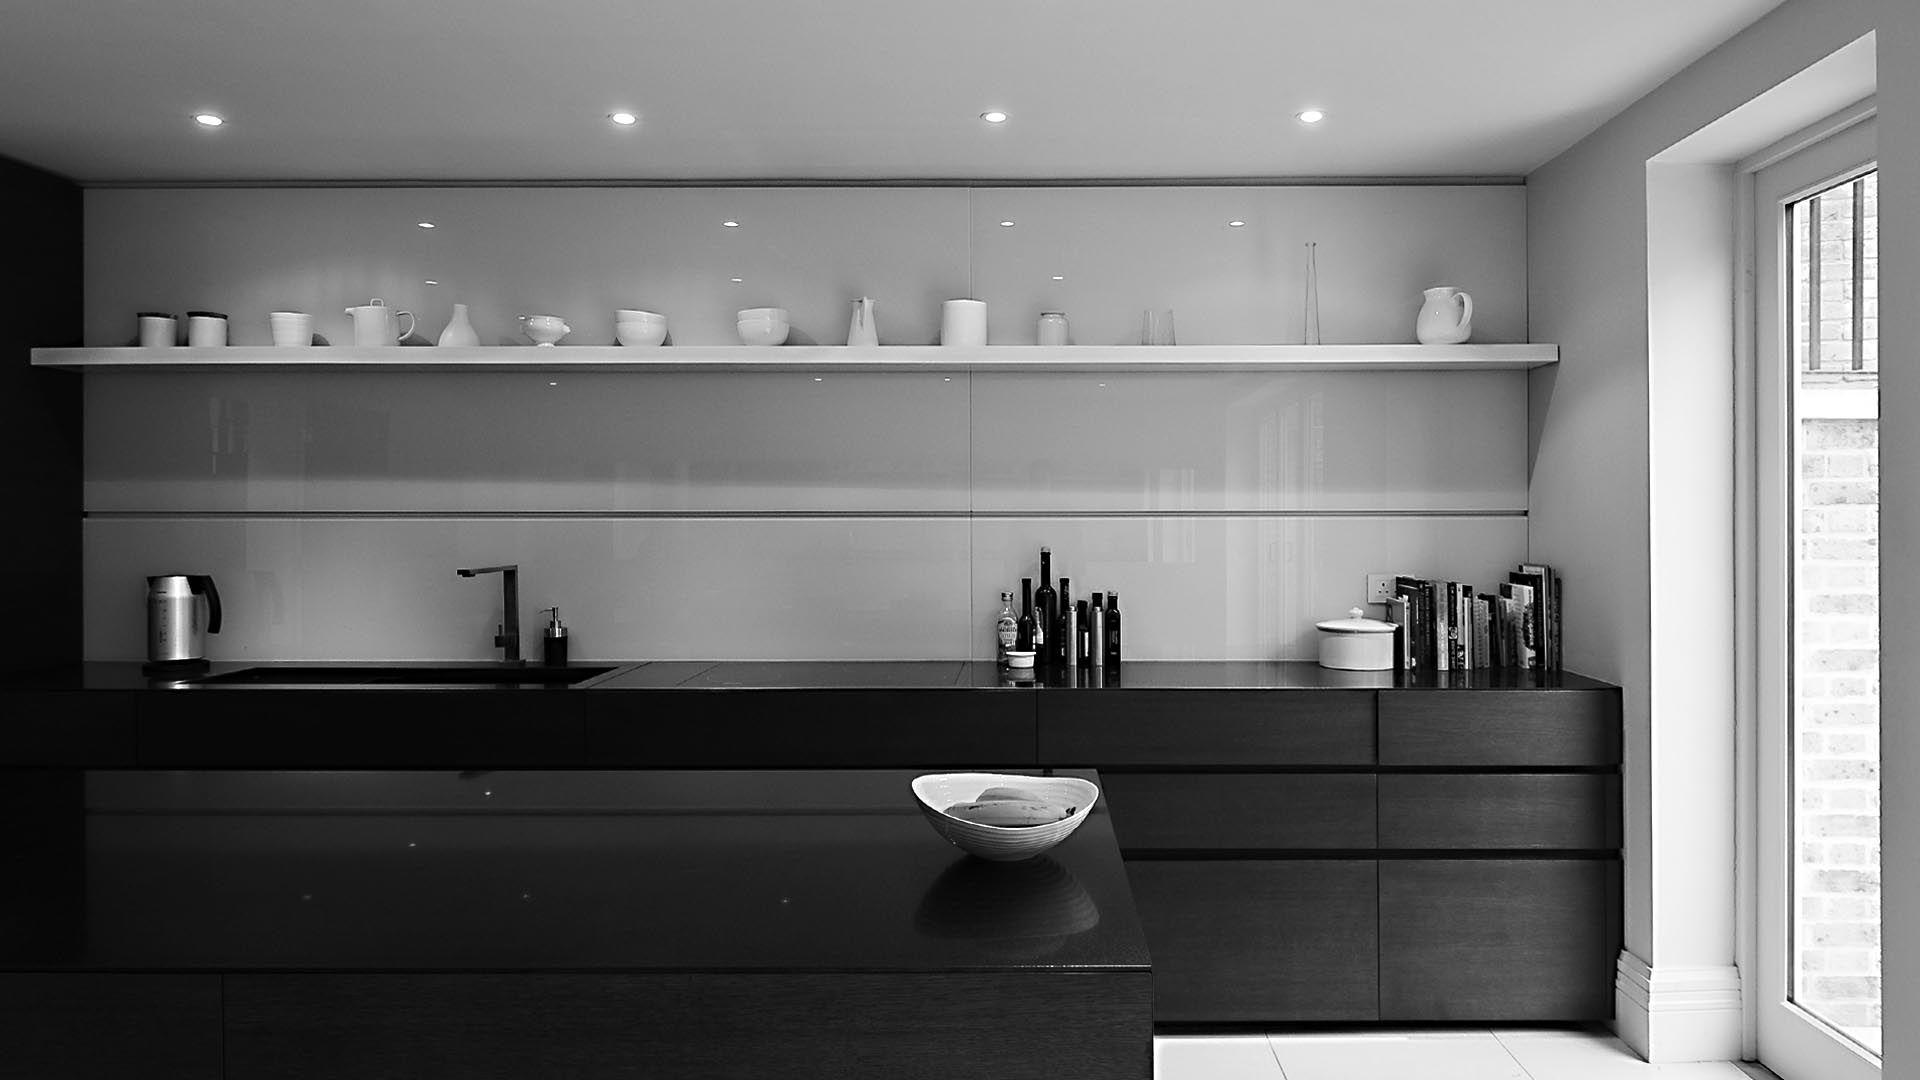 Invisible Speakers Amina Technologies Ltd. | Home, Kitchen ...